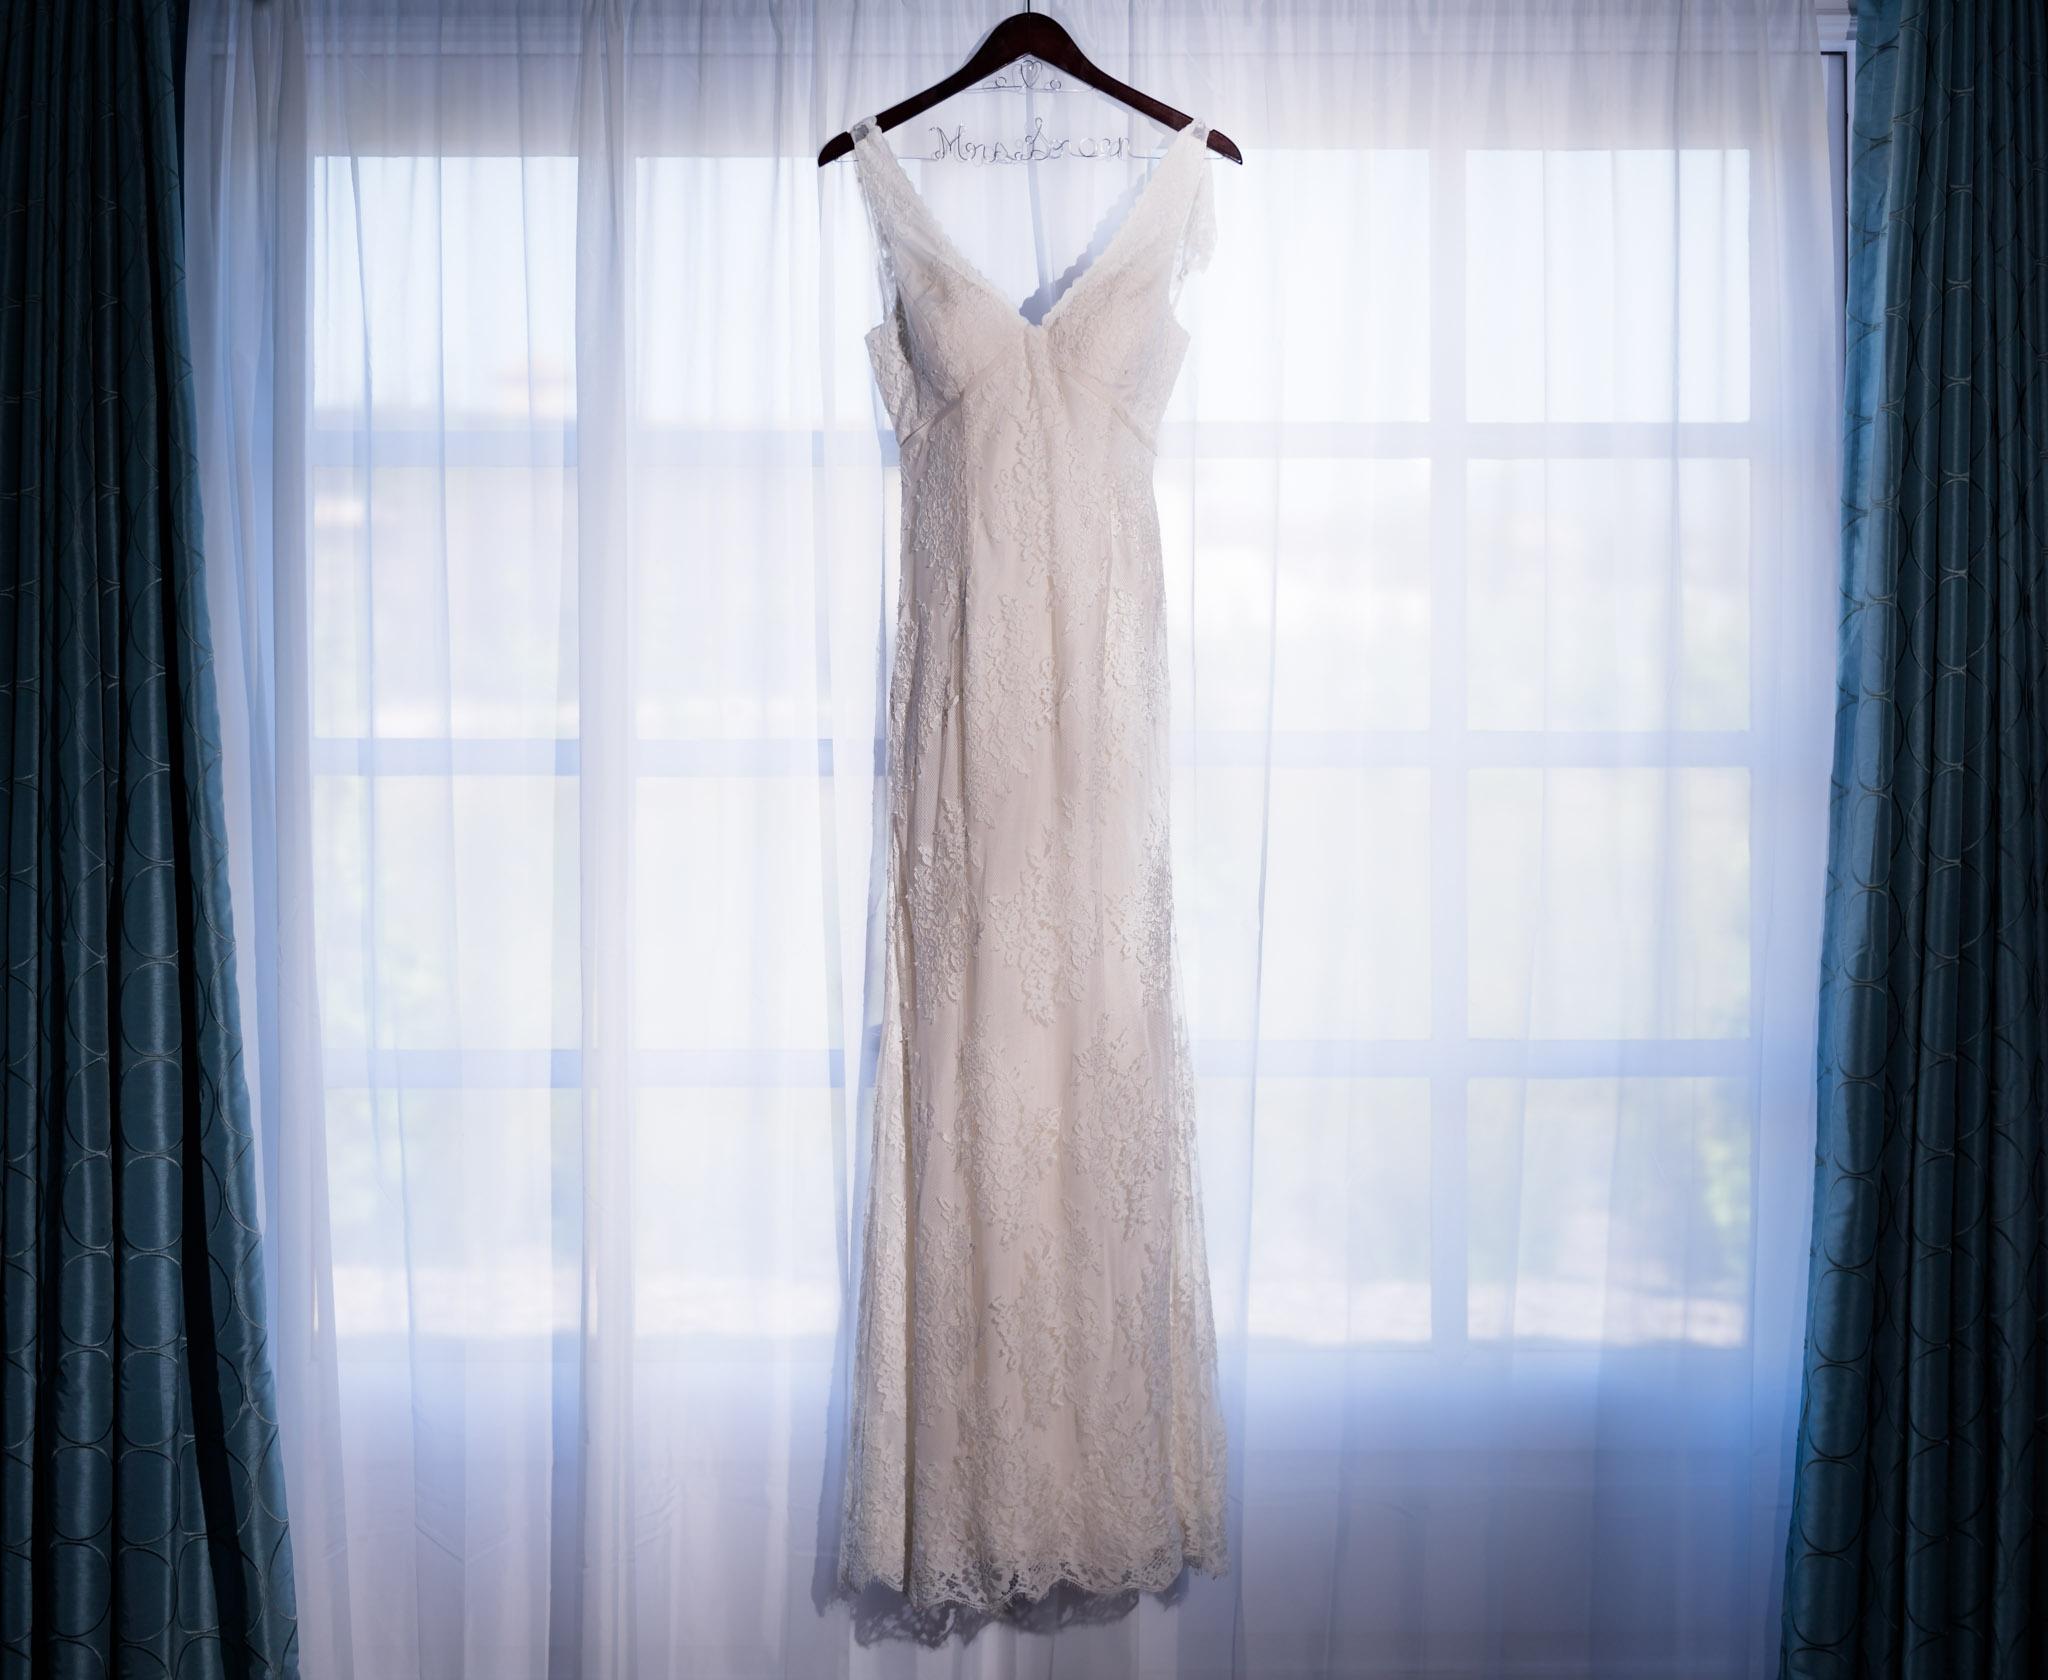 Avensole-Winery-Temecula-Wedding-Josh-and-Olivia-2919.JPG